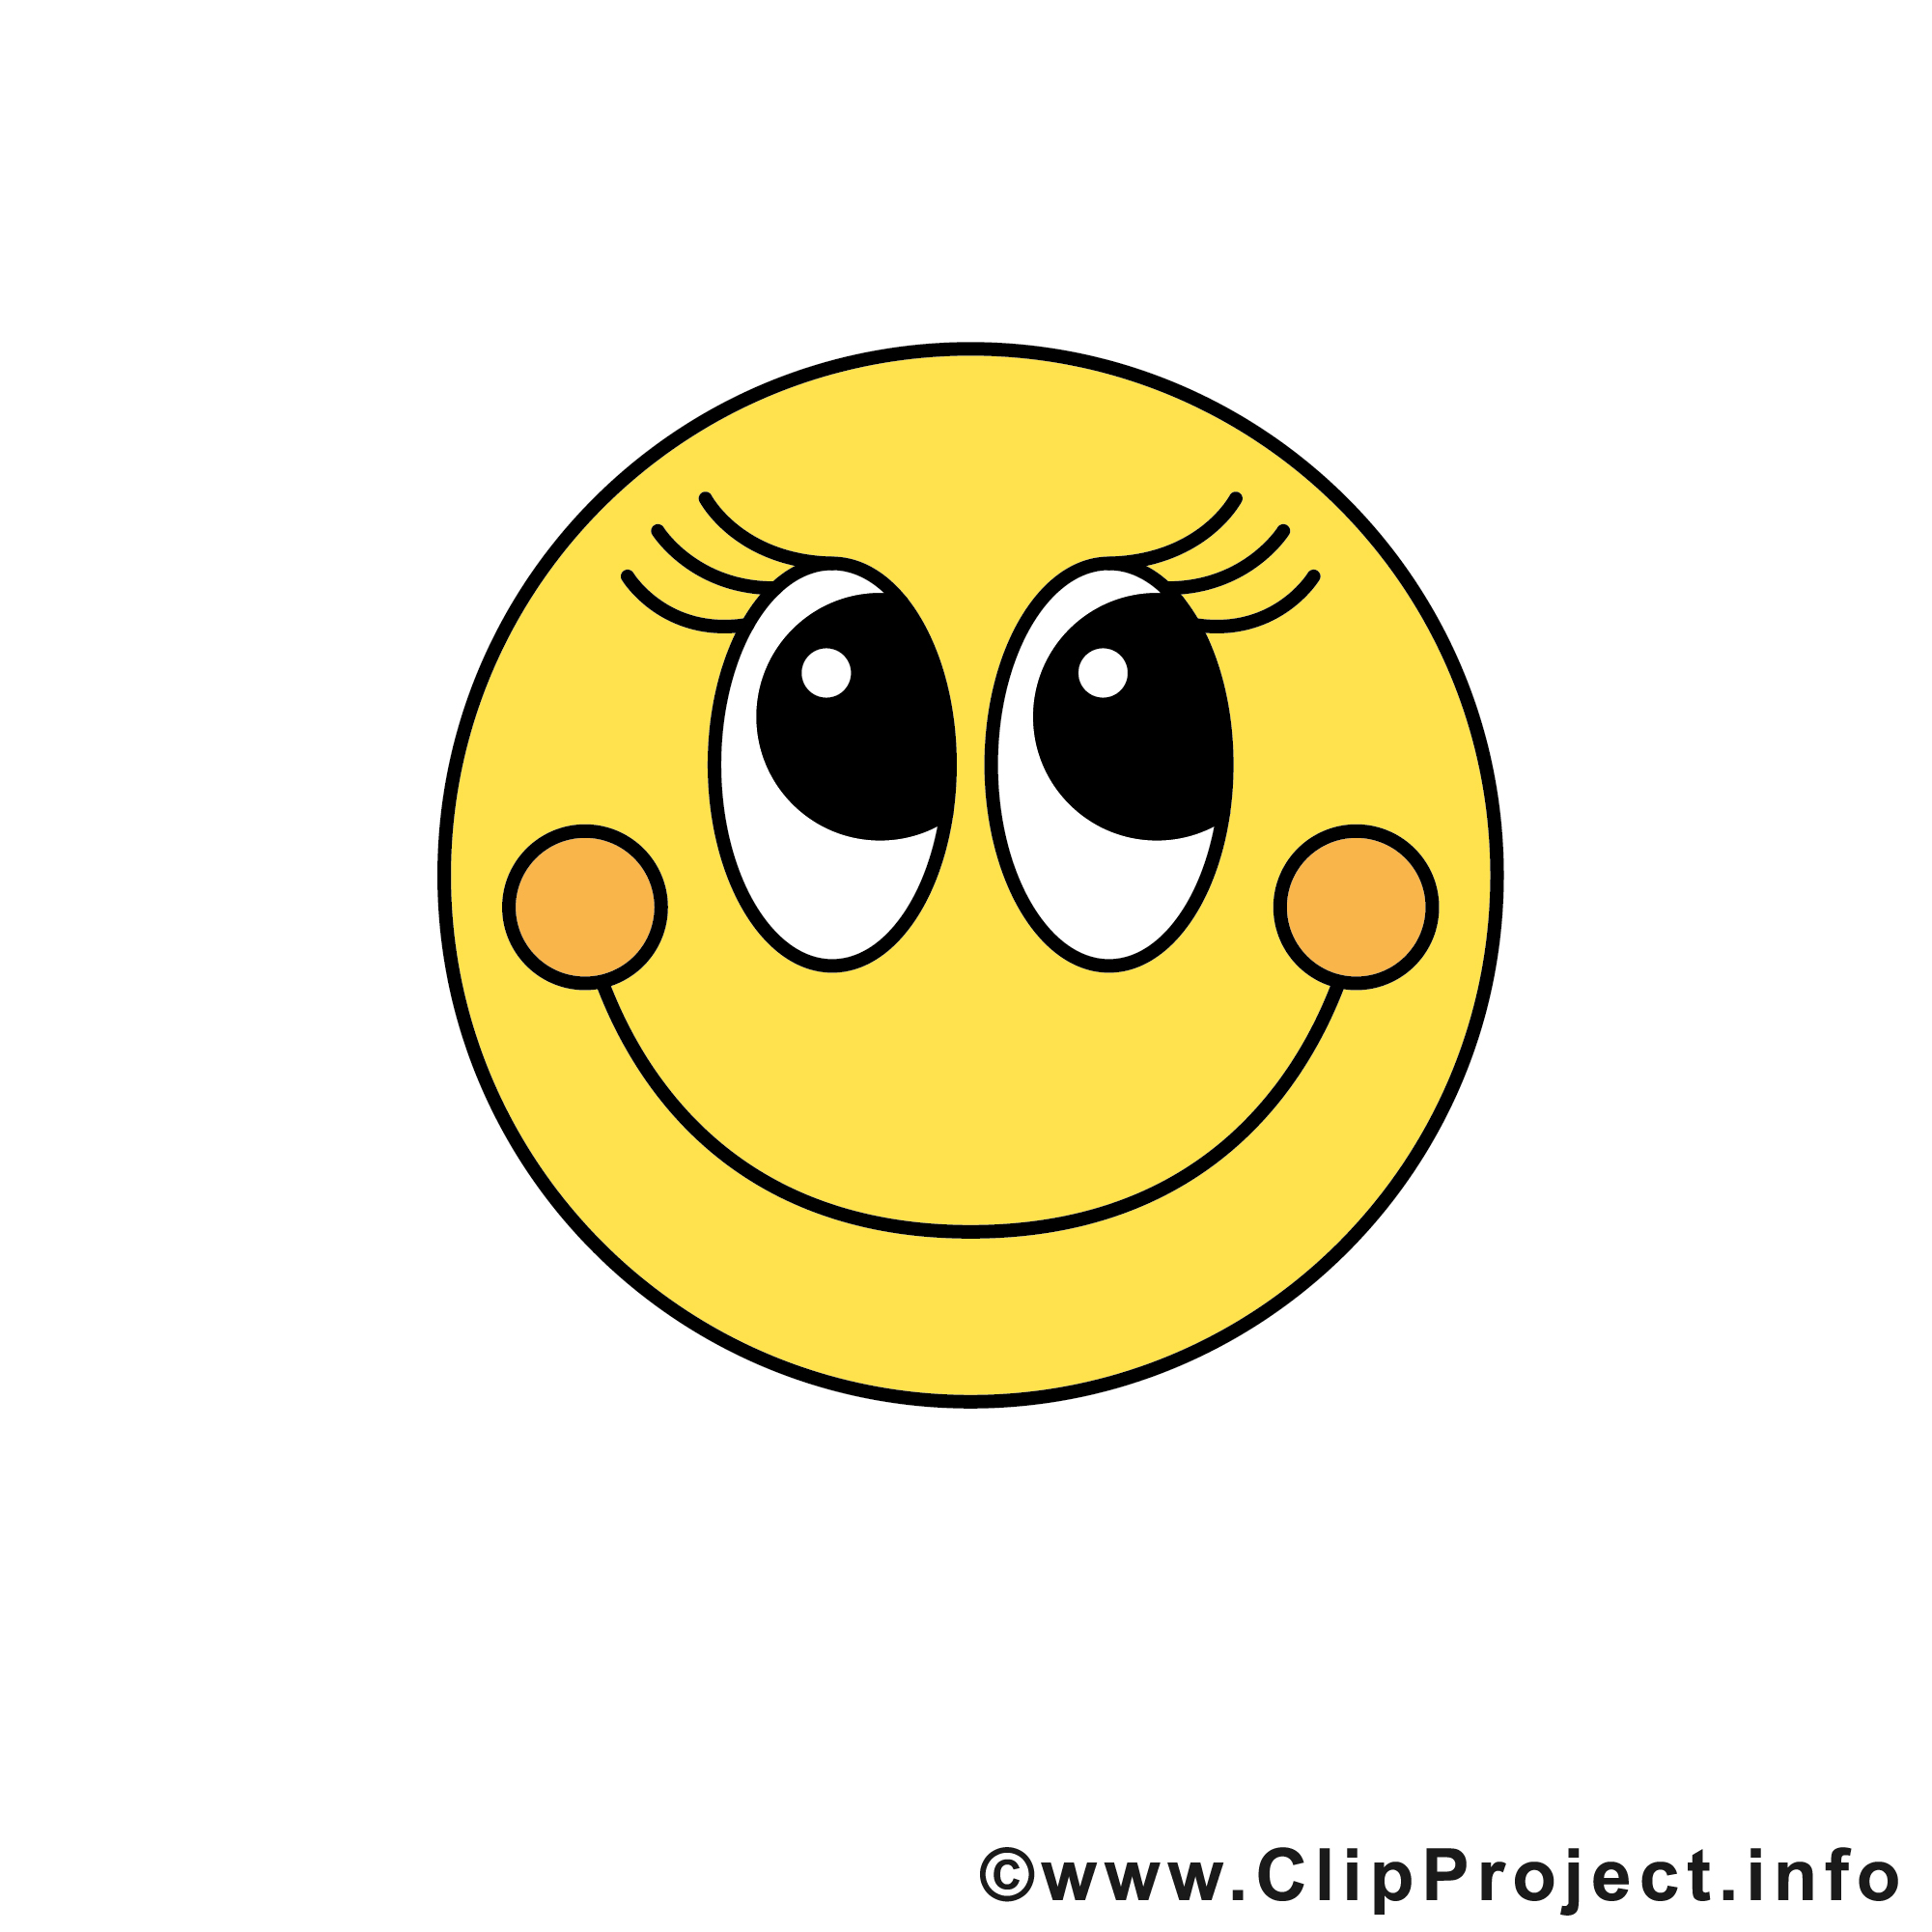 Funny Smiley Central Emoticons